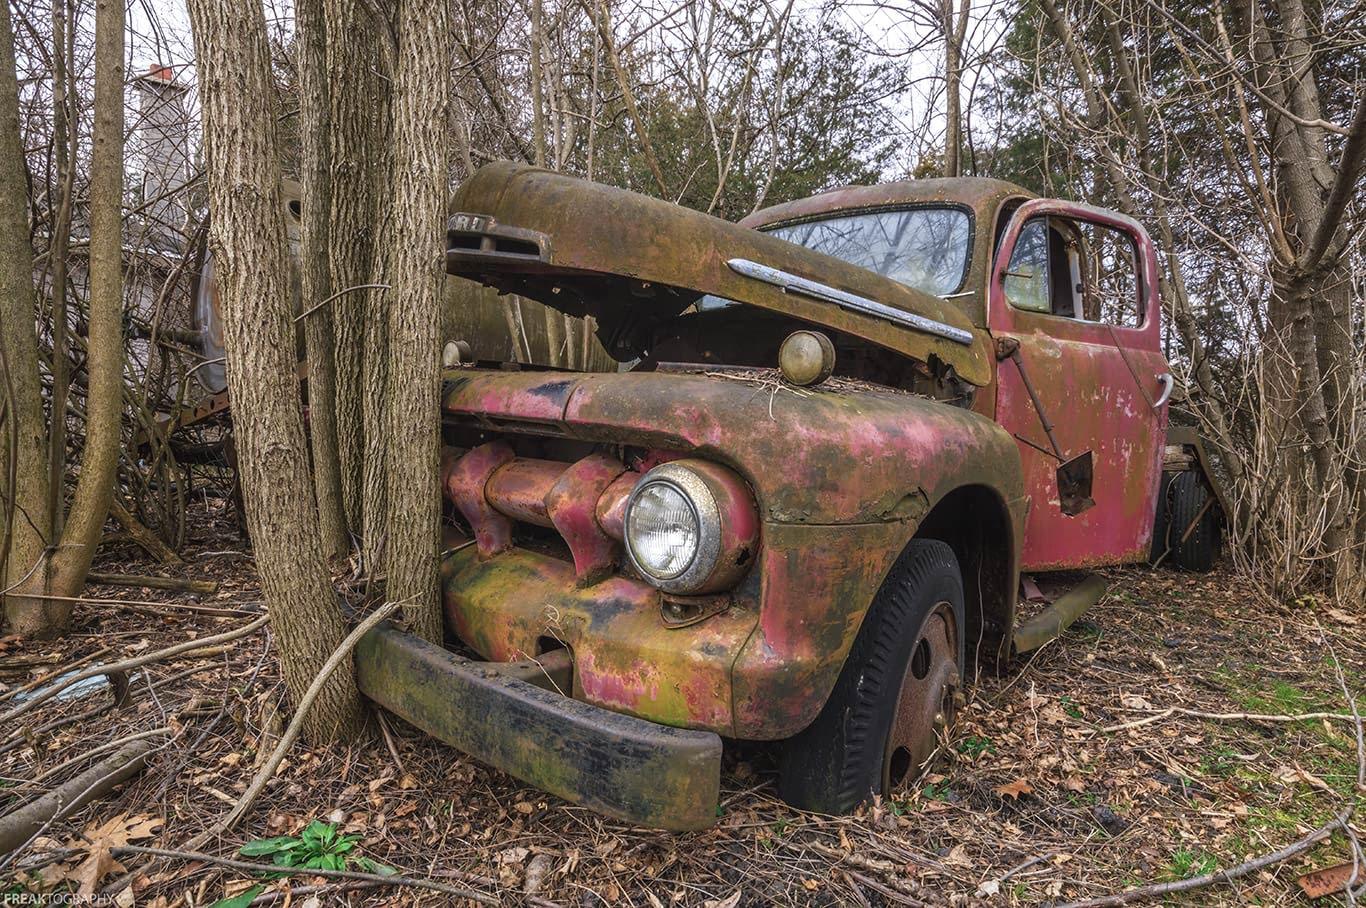 Abandoned Truck Freaktography Print